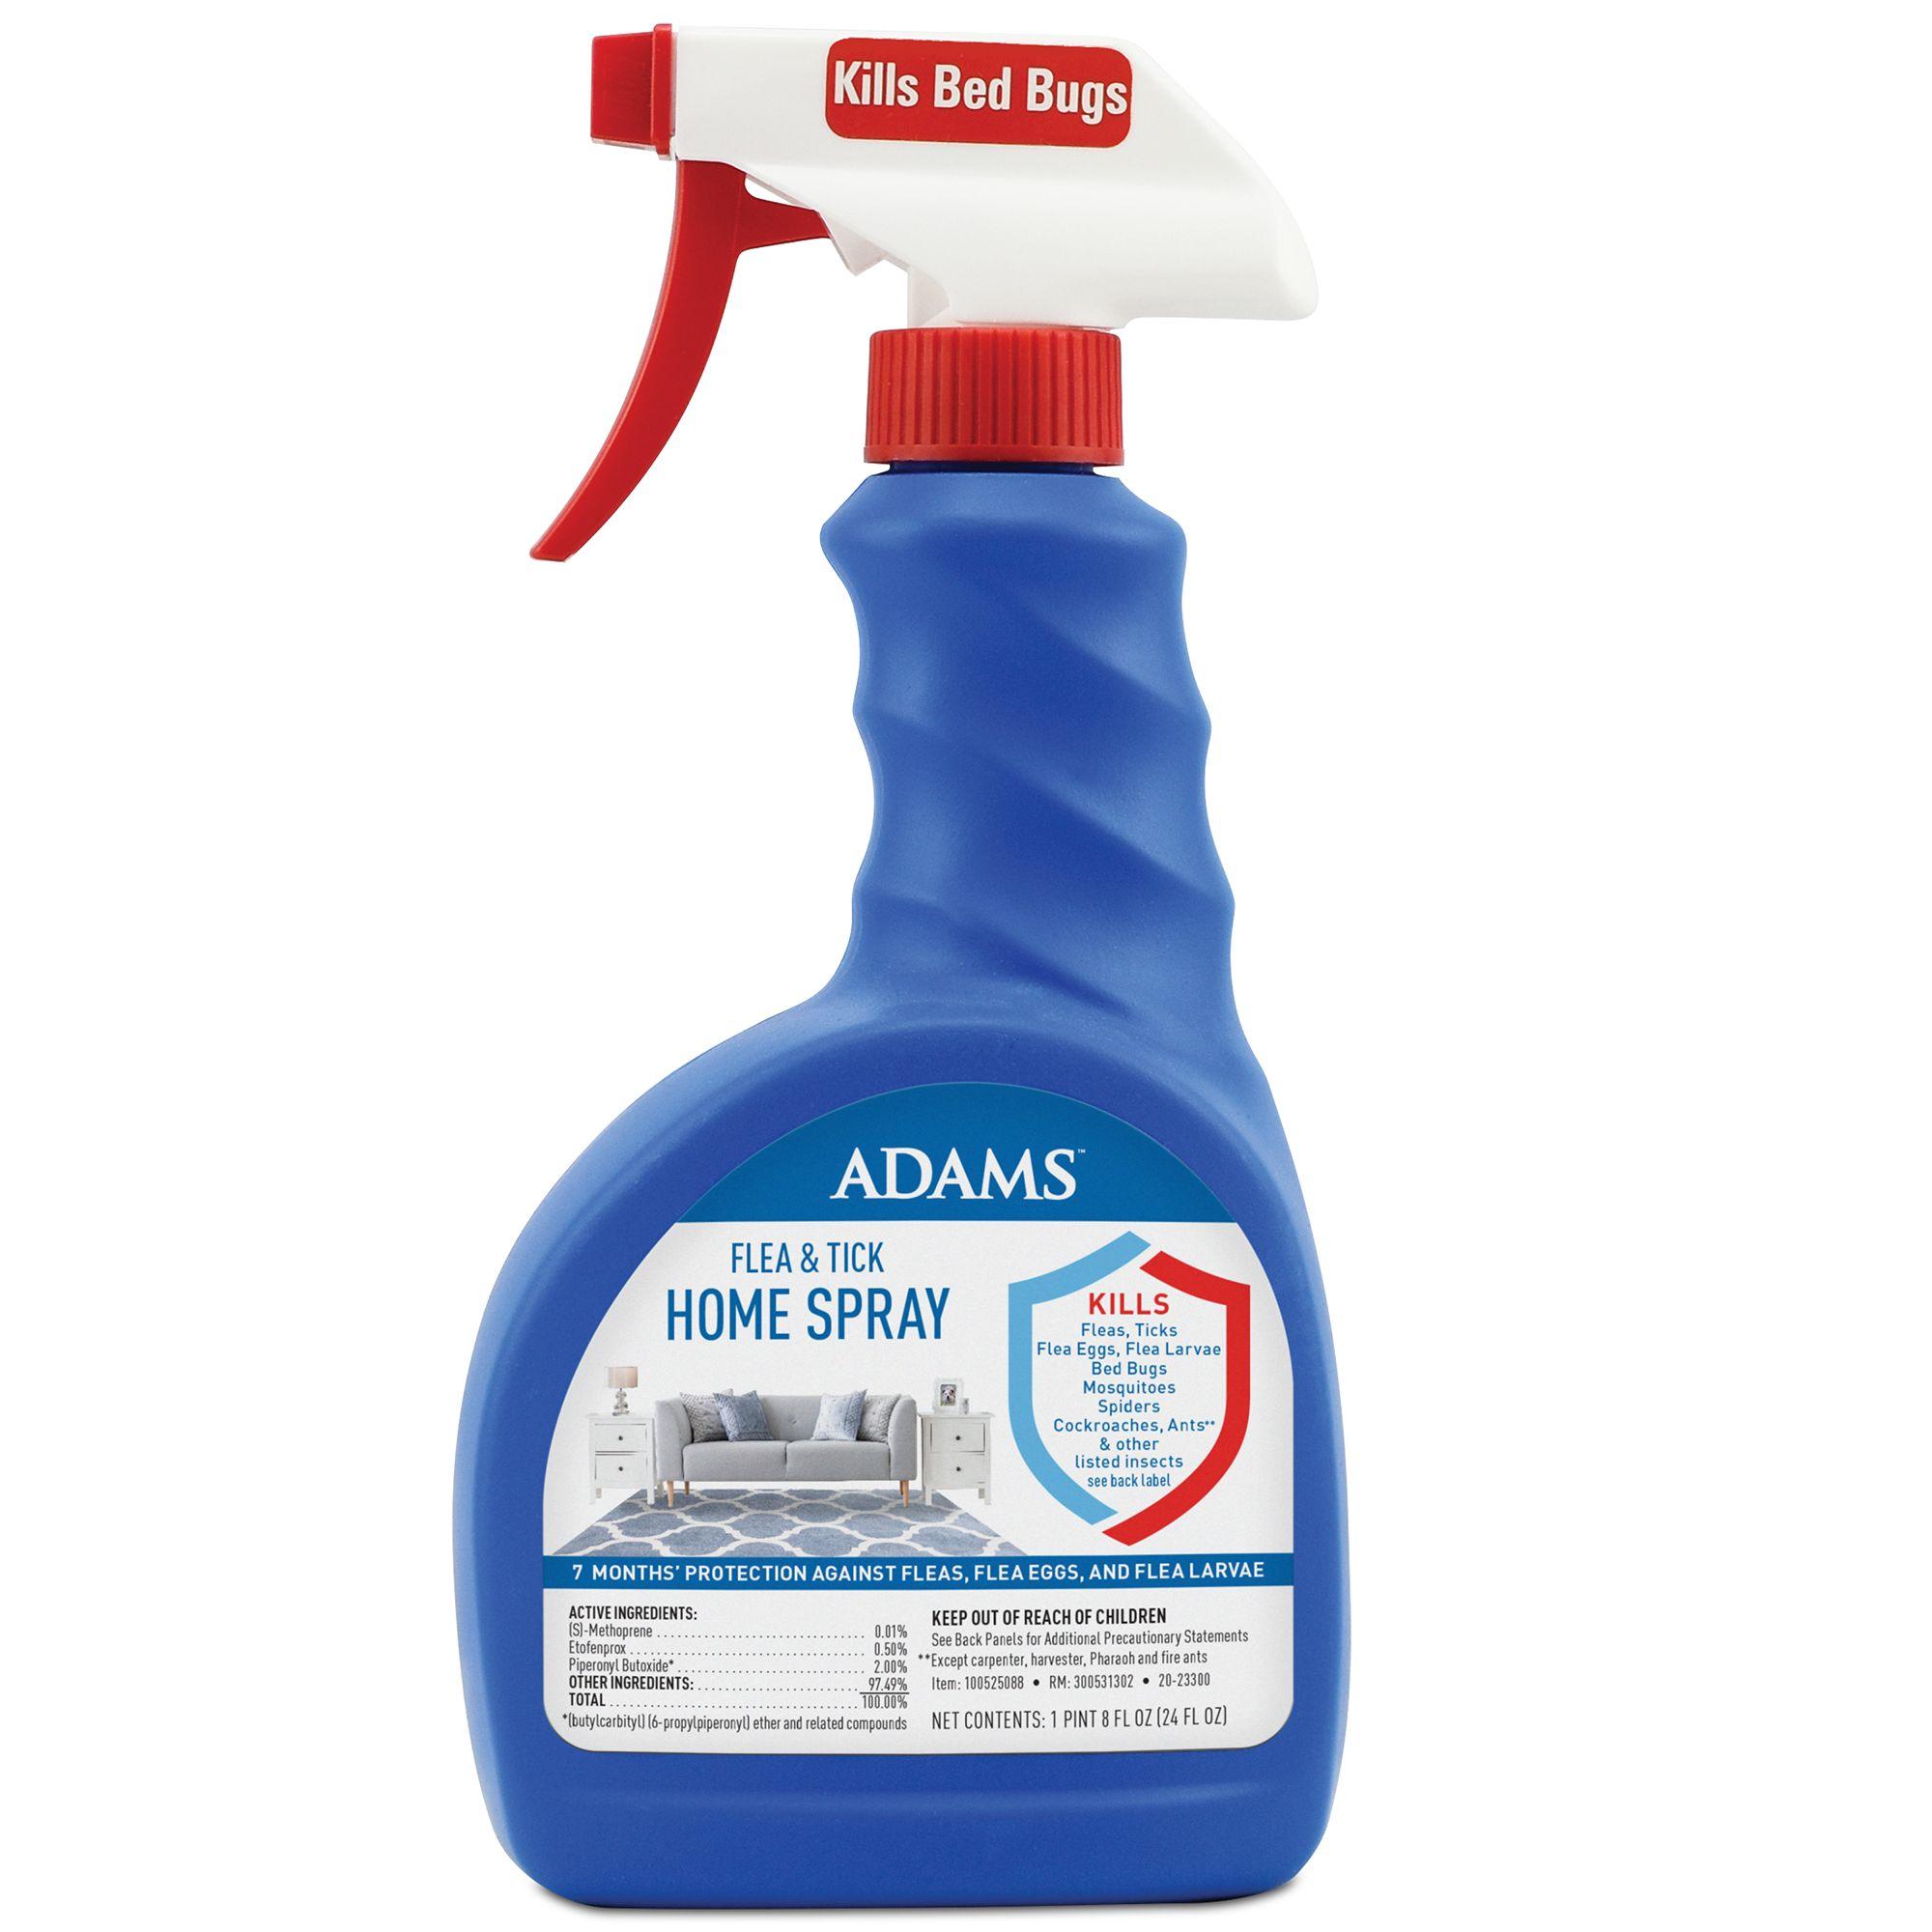 Adams Plus Flea And Tick Home Spray